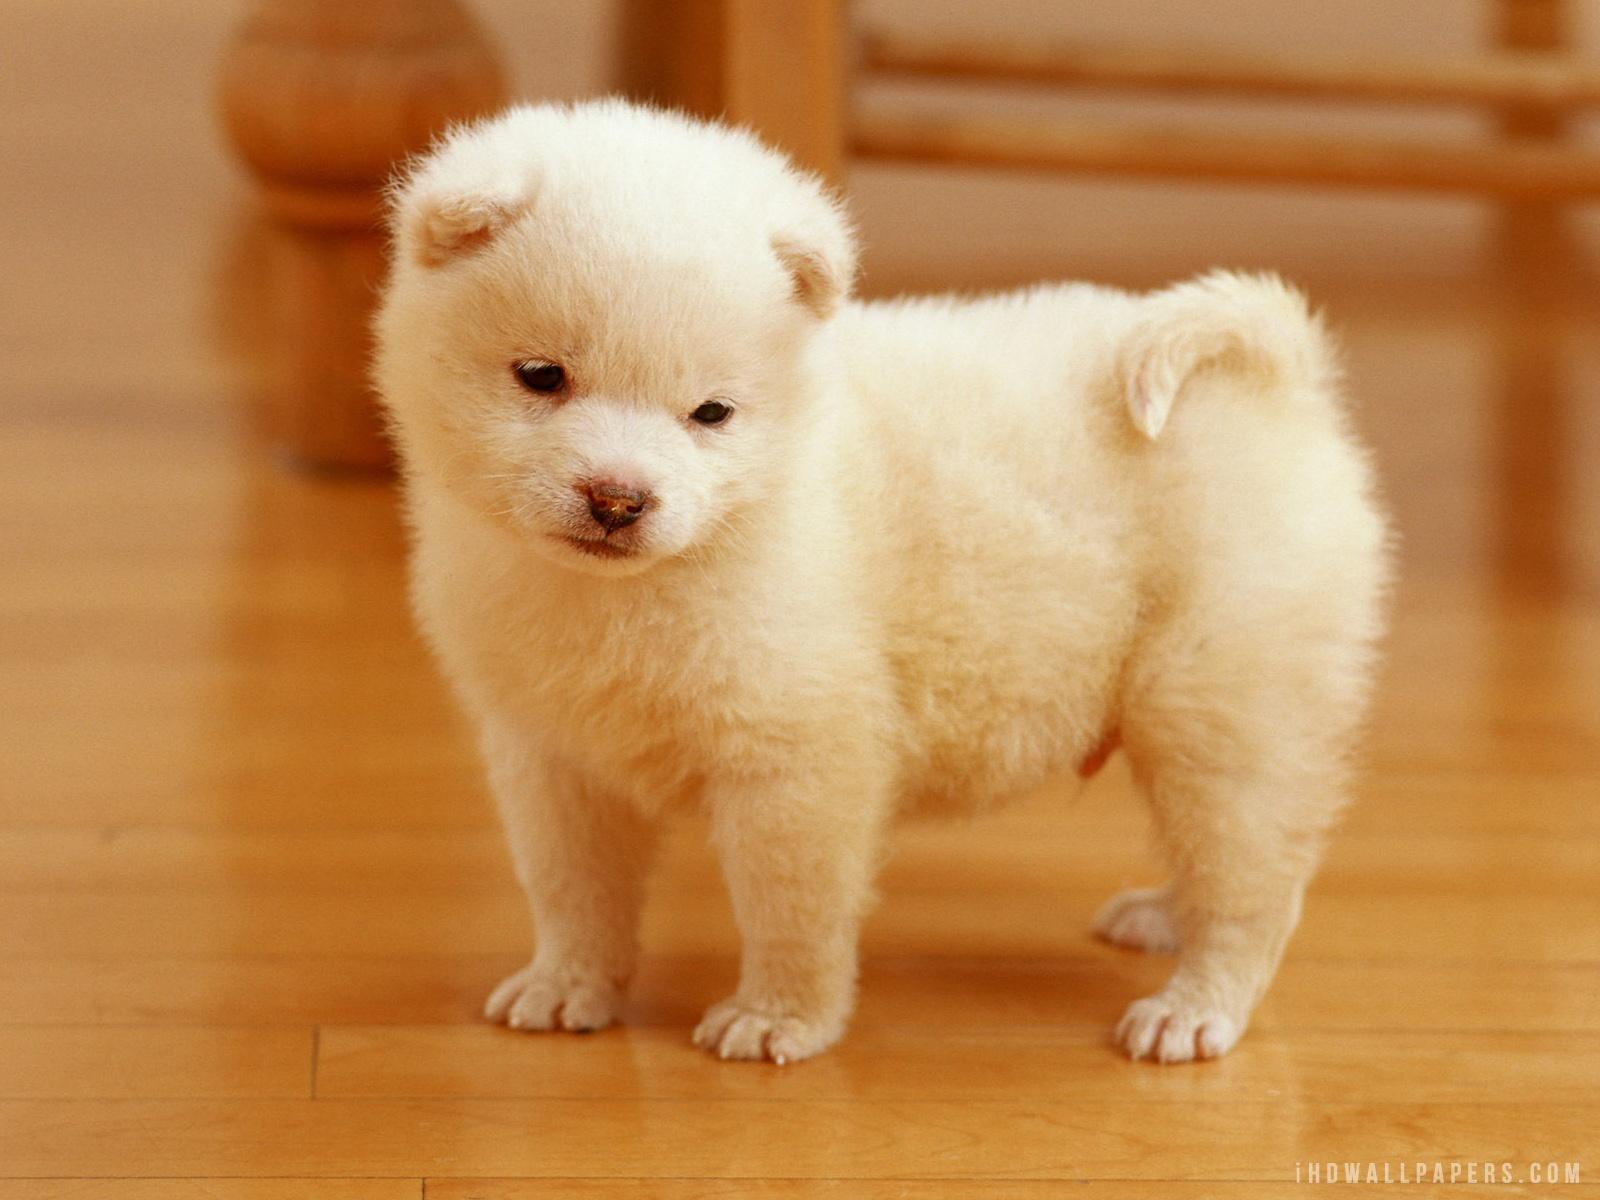 Description Download Cute Puppy WallpaperBackground in 1600x1200 HD 1600x1200